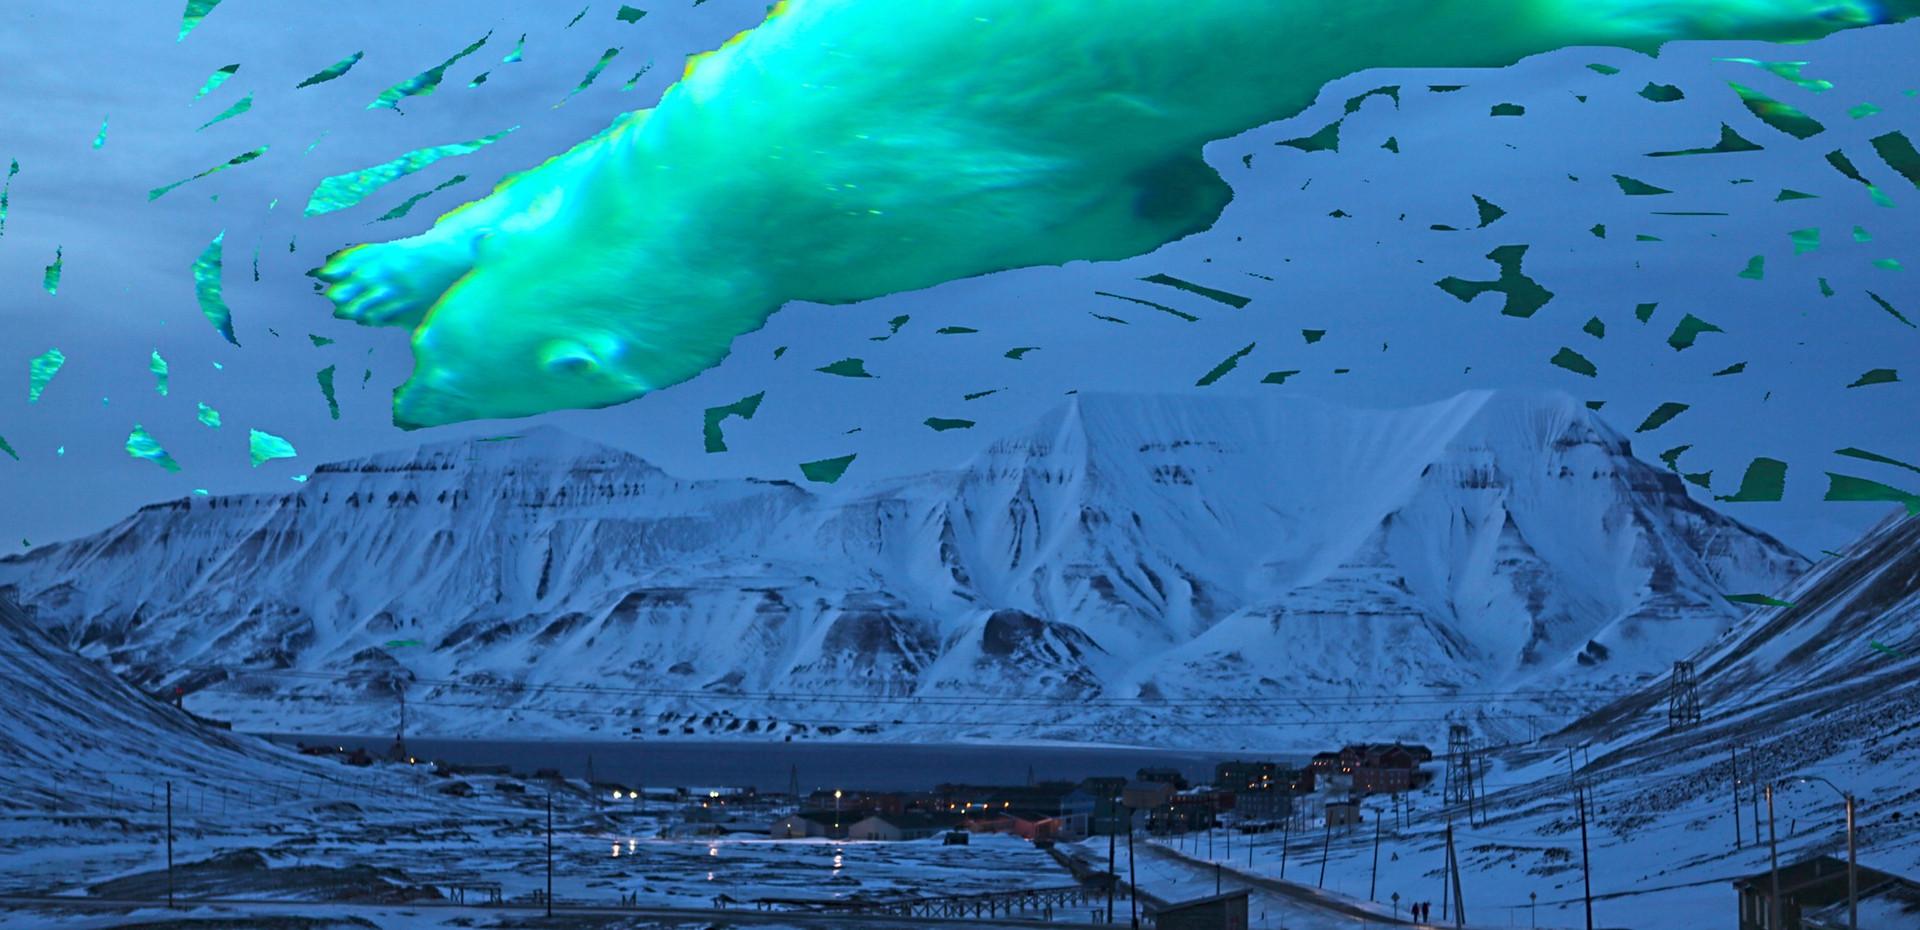 Bears Dream of Svalbard